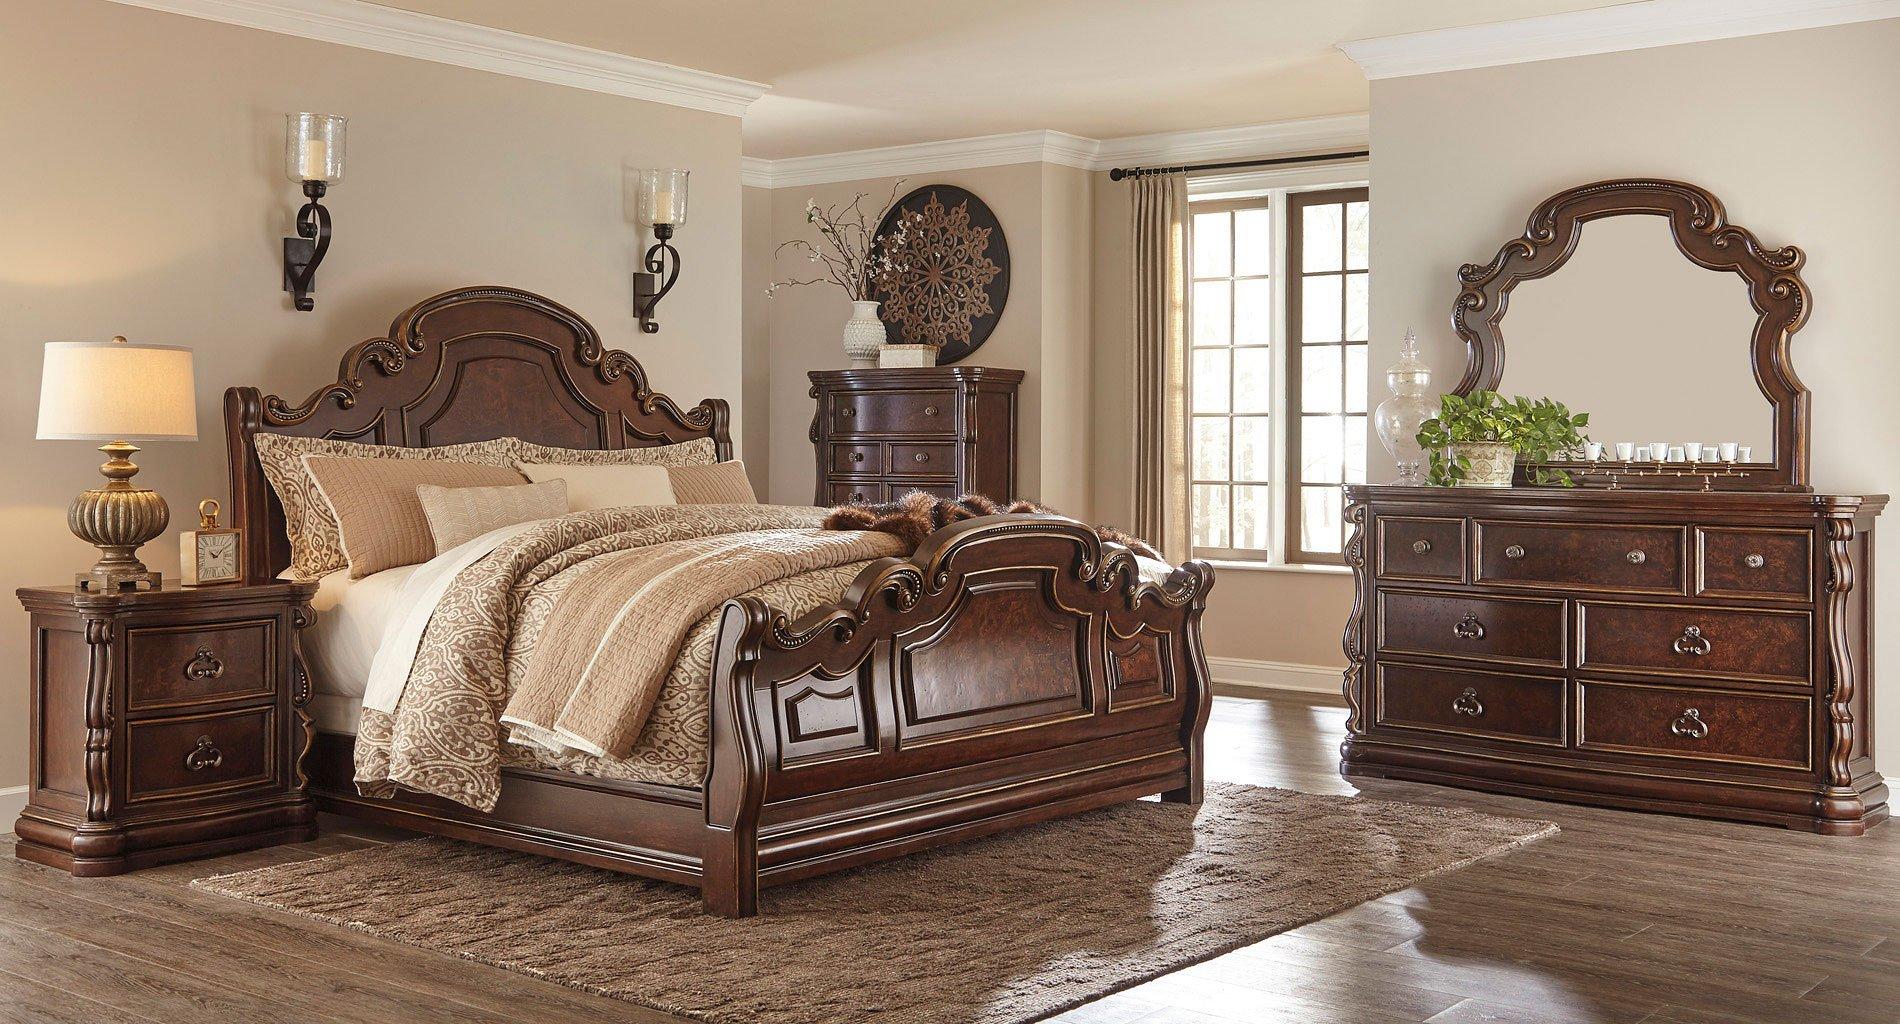 Superbe Florentown Sleigh Bedroom Set